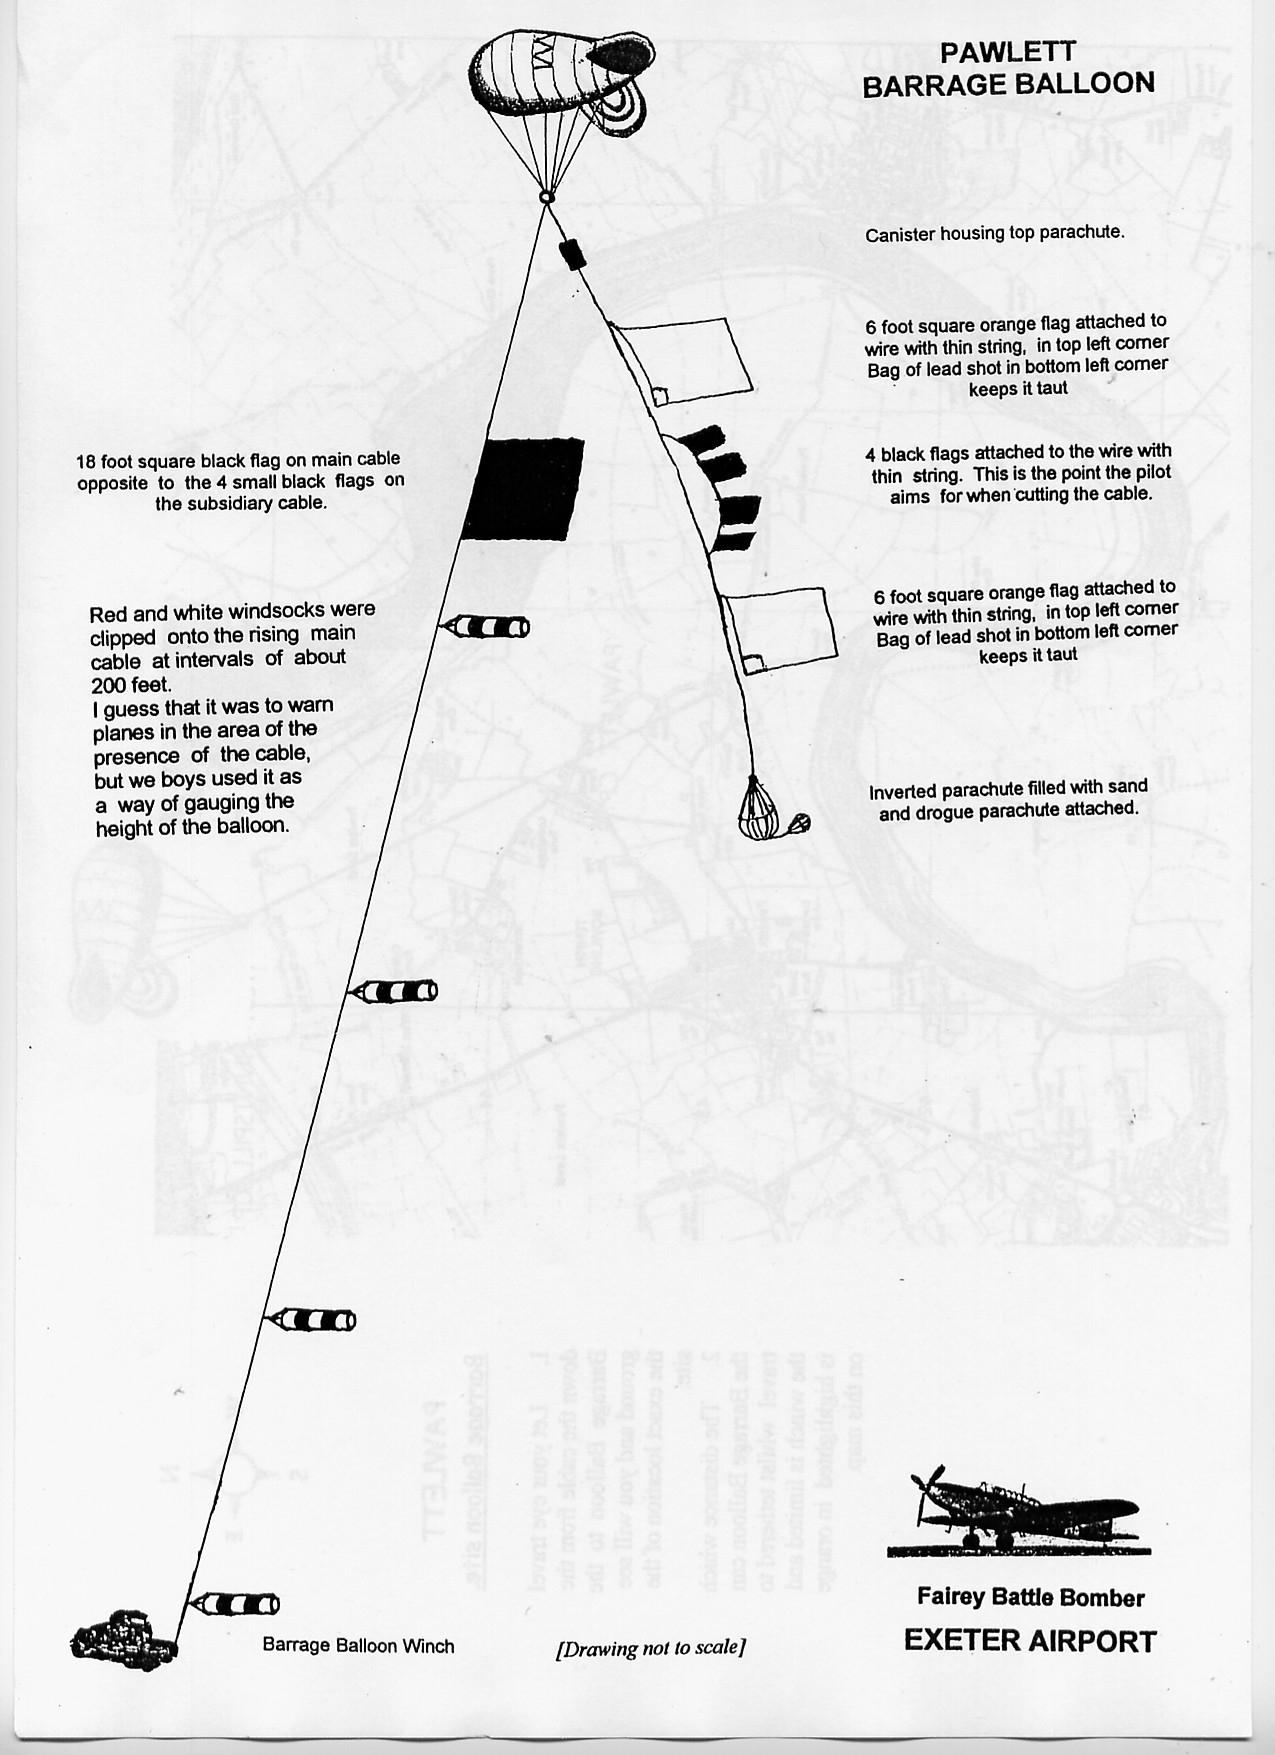 diagram of wart